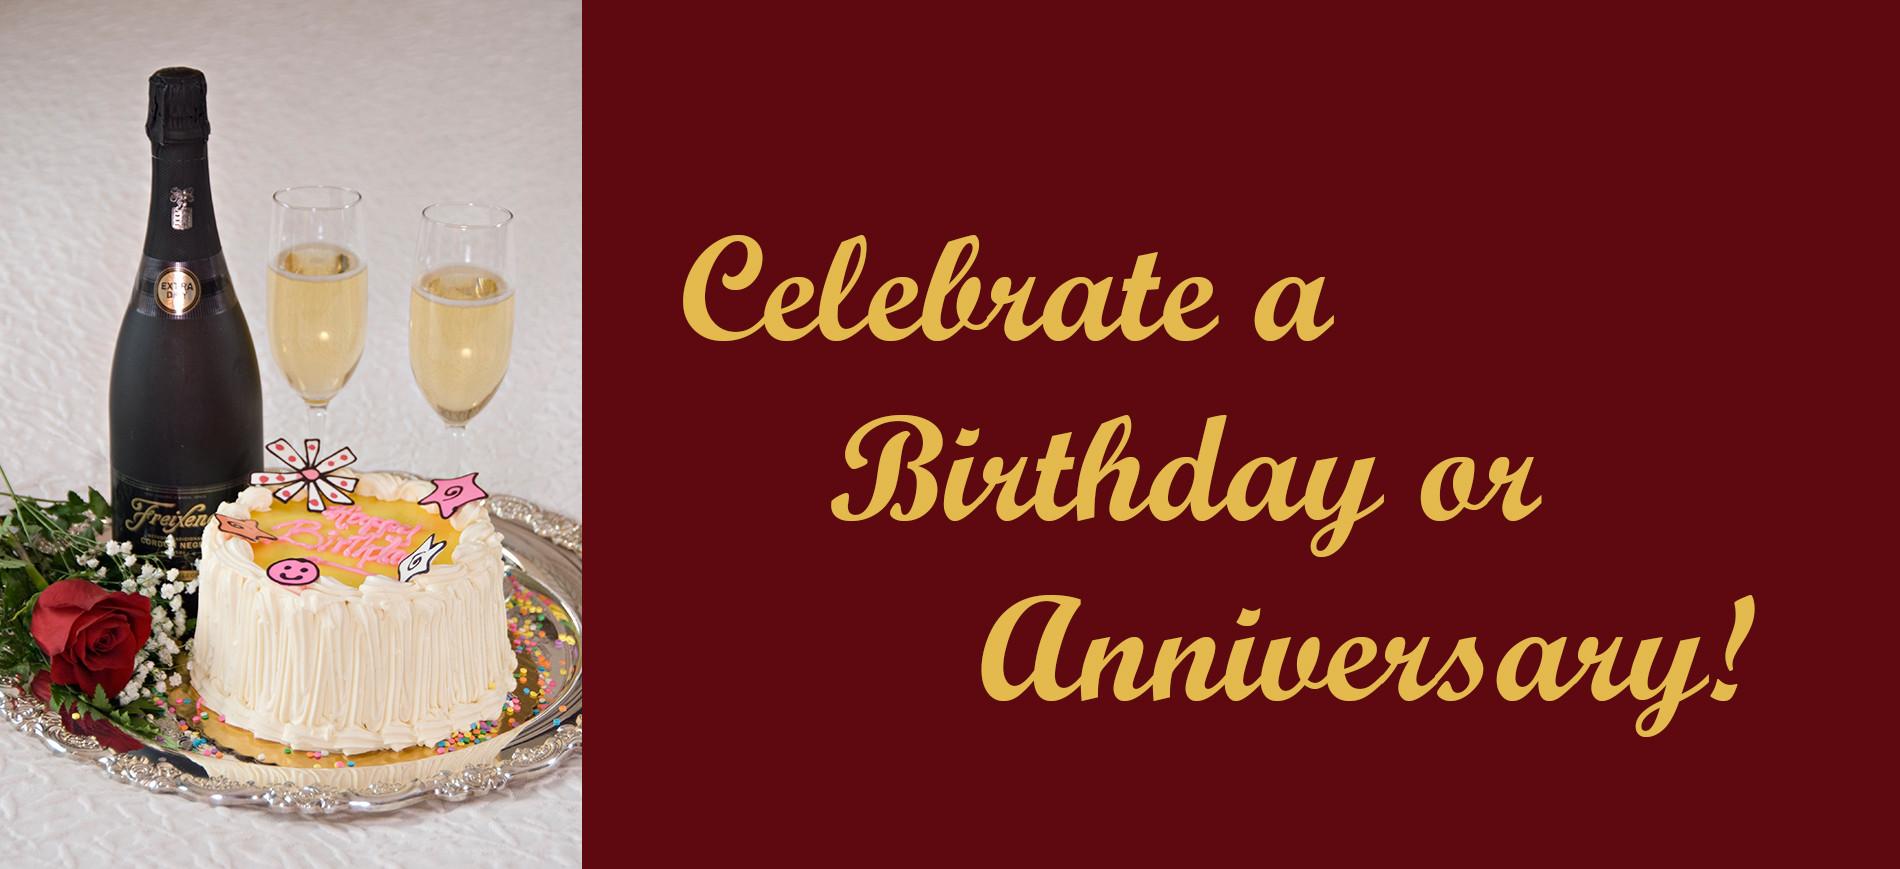 Celebrate a birthday or anniversary